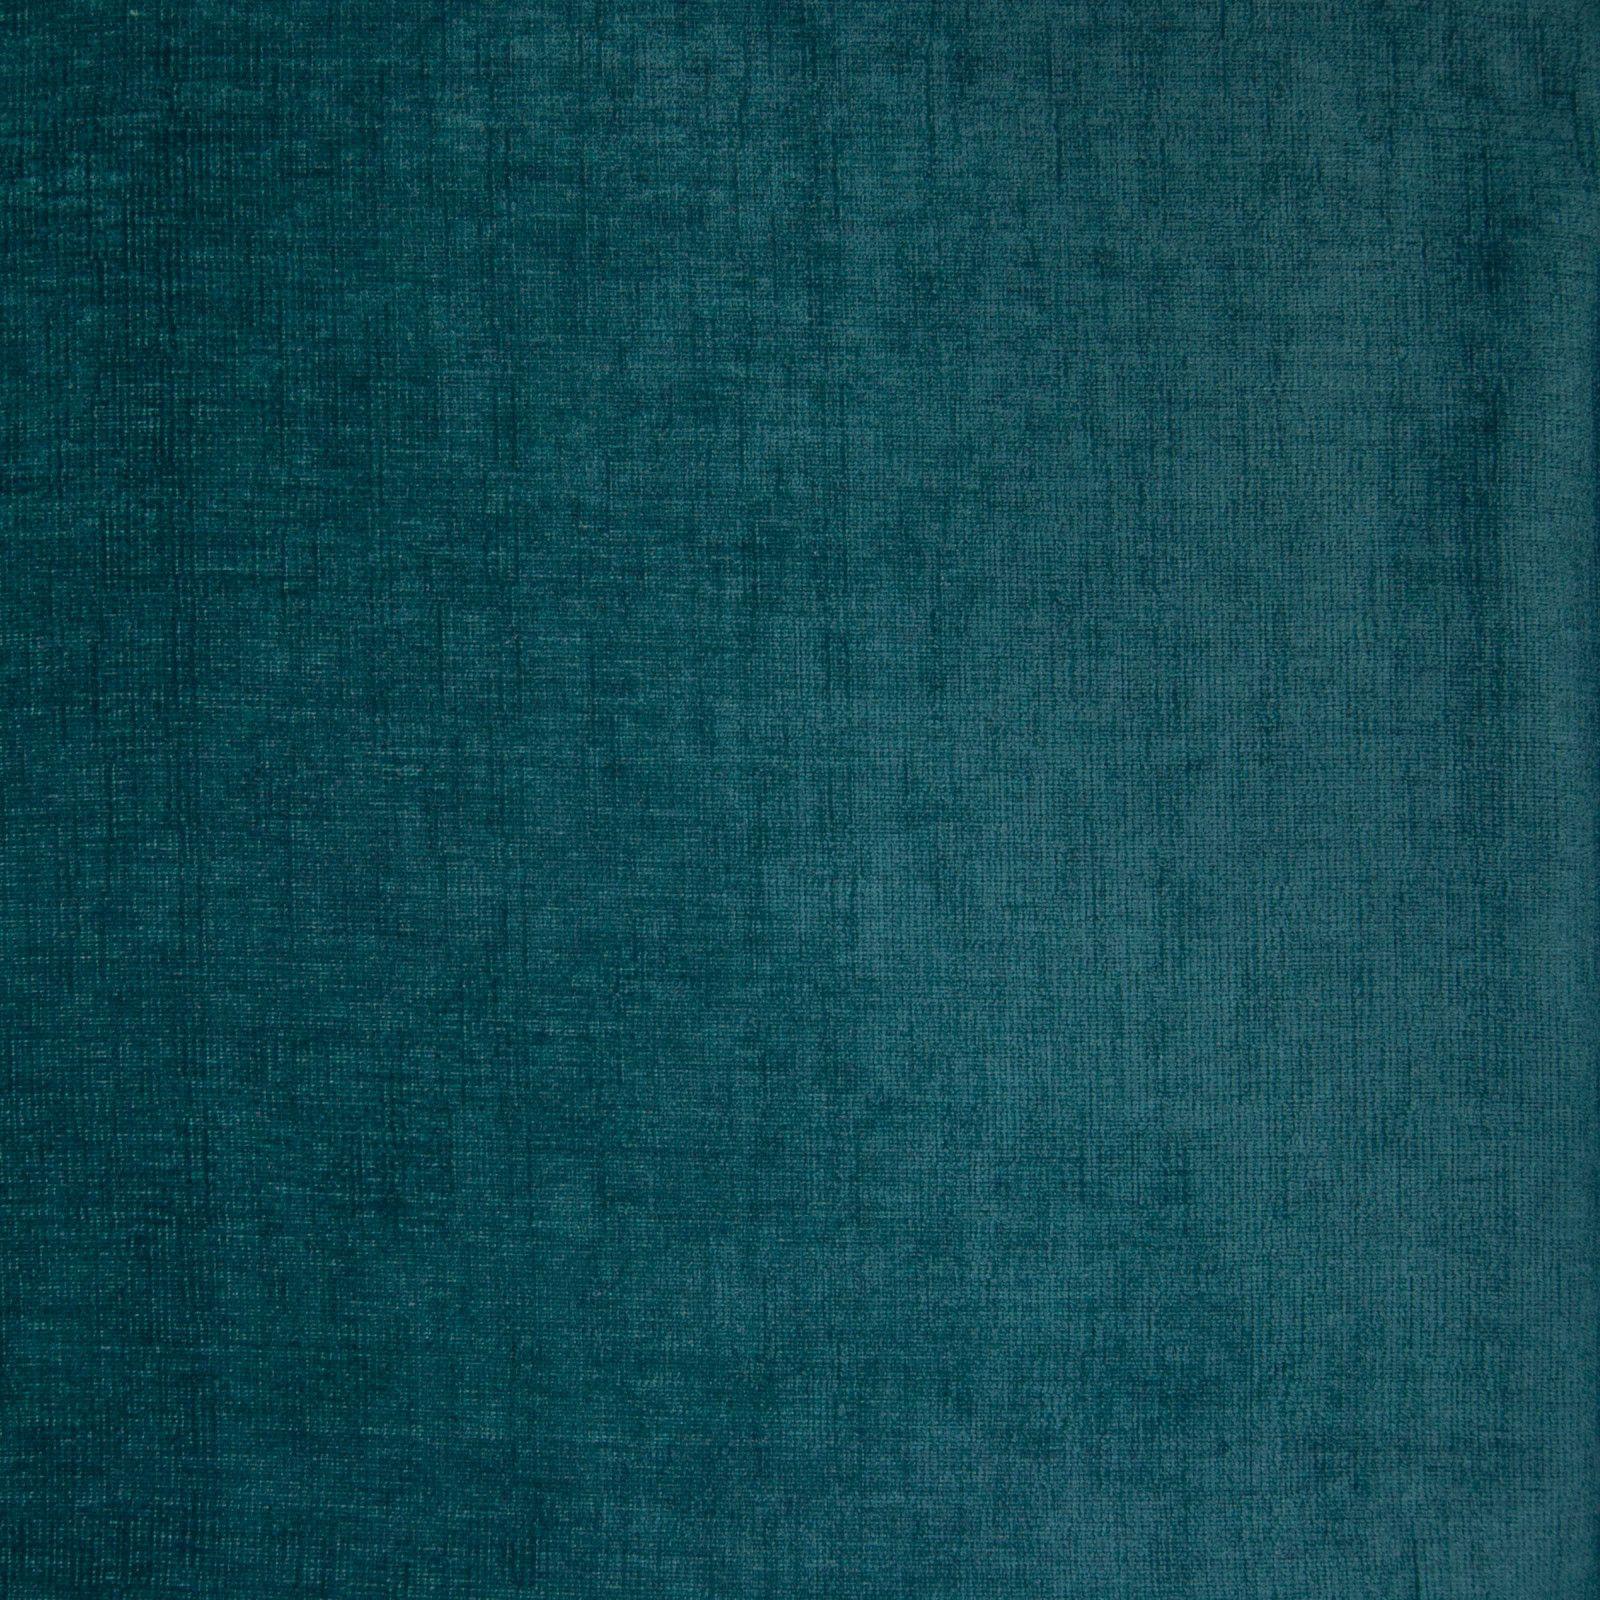 velvet sofa fabric online india second hand brown leather sofas uk b6634 peacock trends 2017  greenhouse fabrics